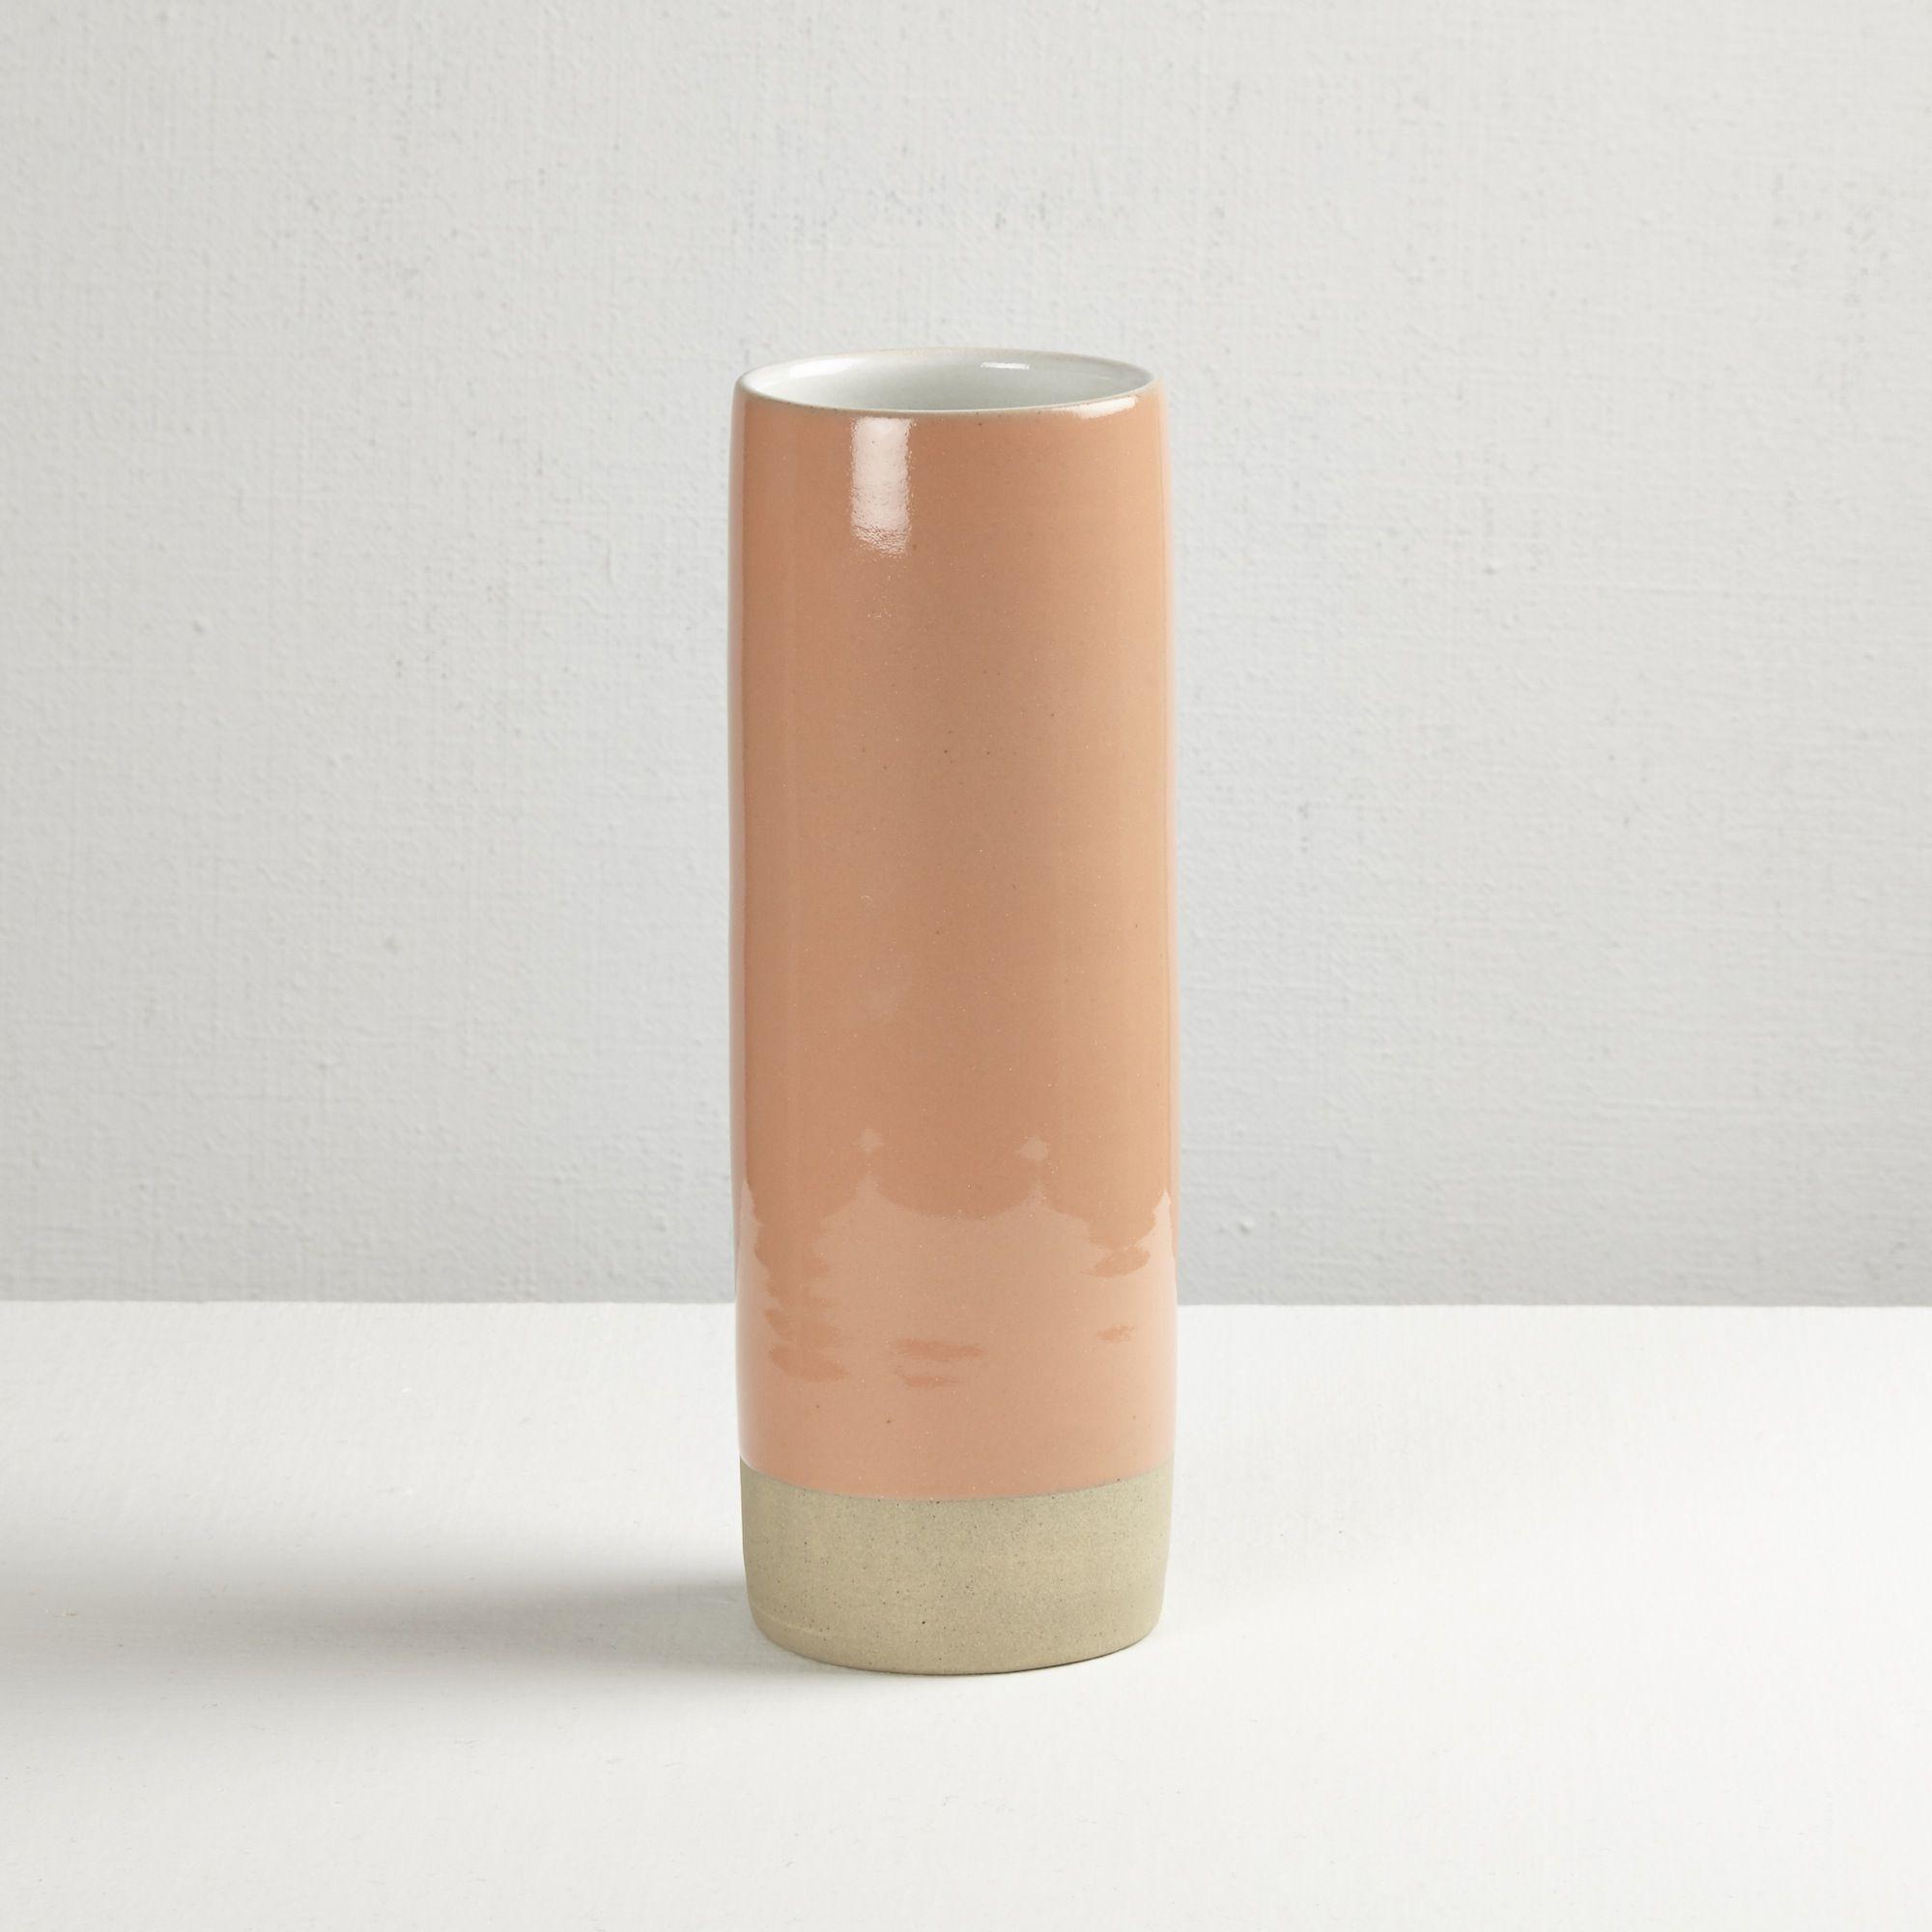 home goods decorative vases.htm les guimards medium cylinder vase  white   coral  with images  cylinder vase  white   coral